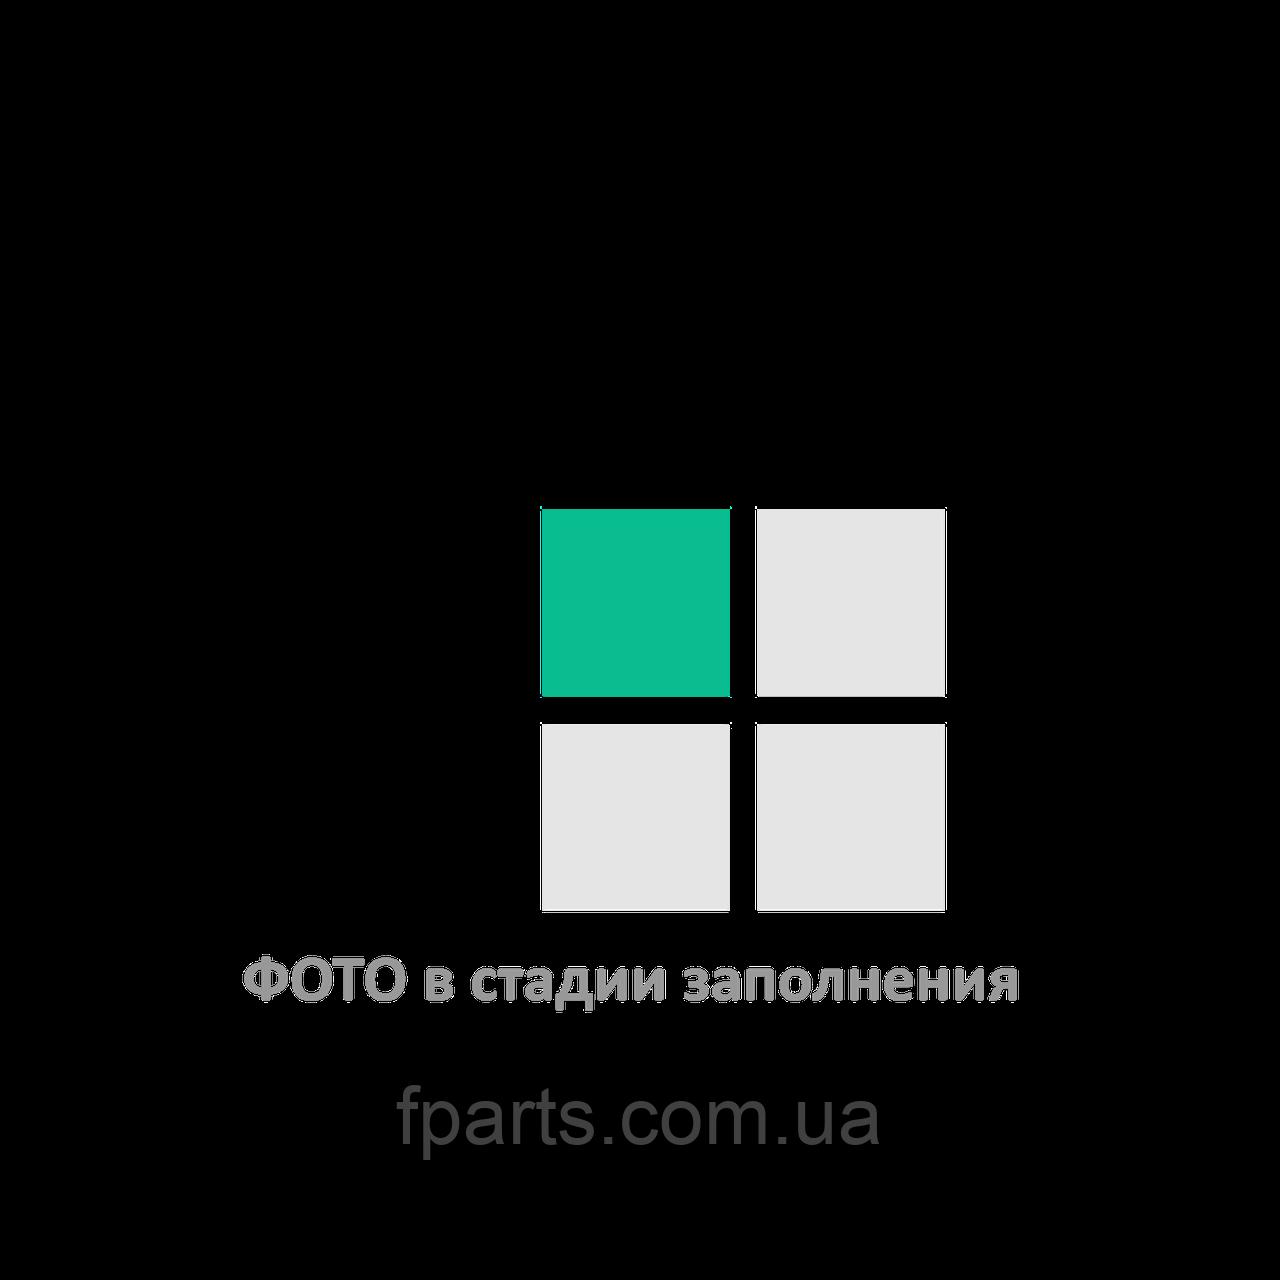 Дисплей Nokia 5800/5230/5228/5235/N97mini/C5-03/C6-00/X6-00/N500